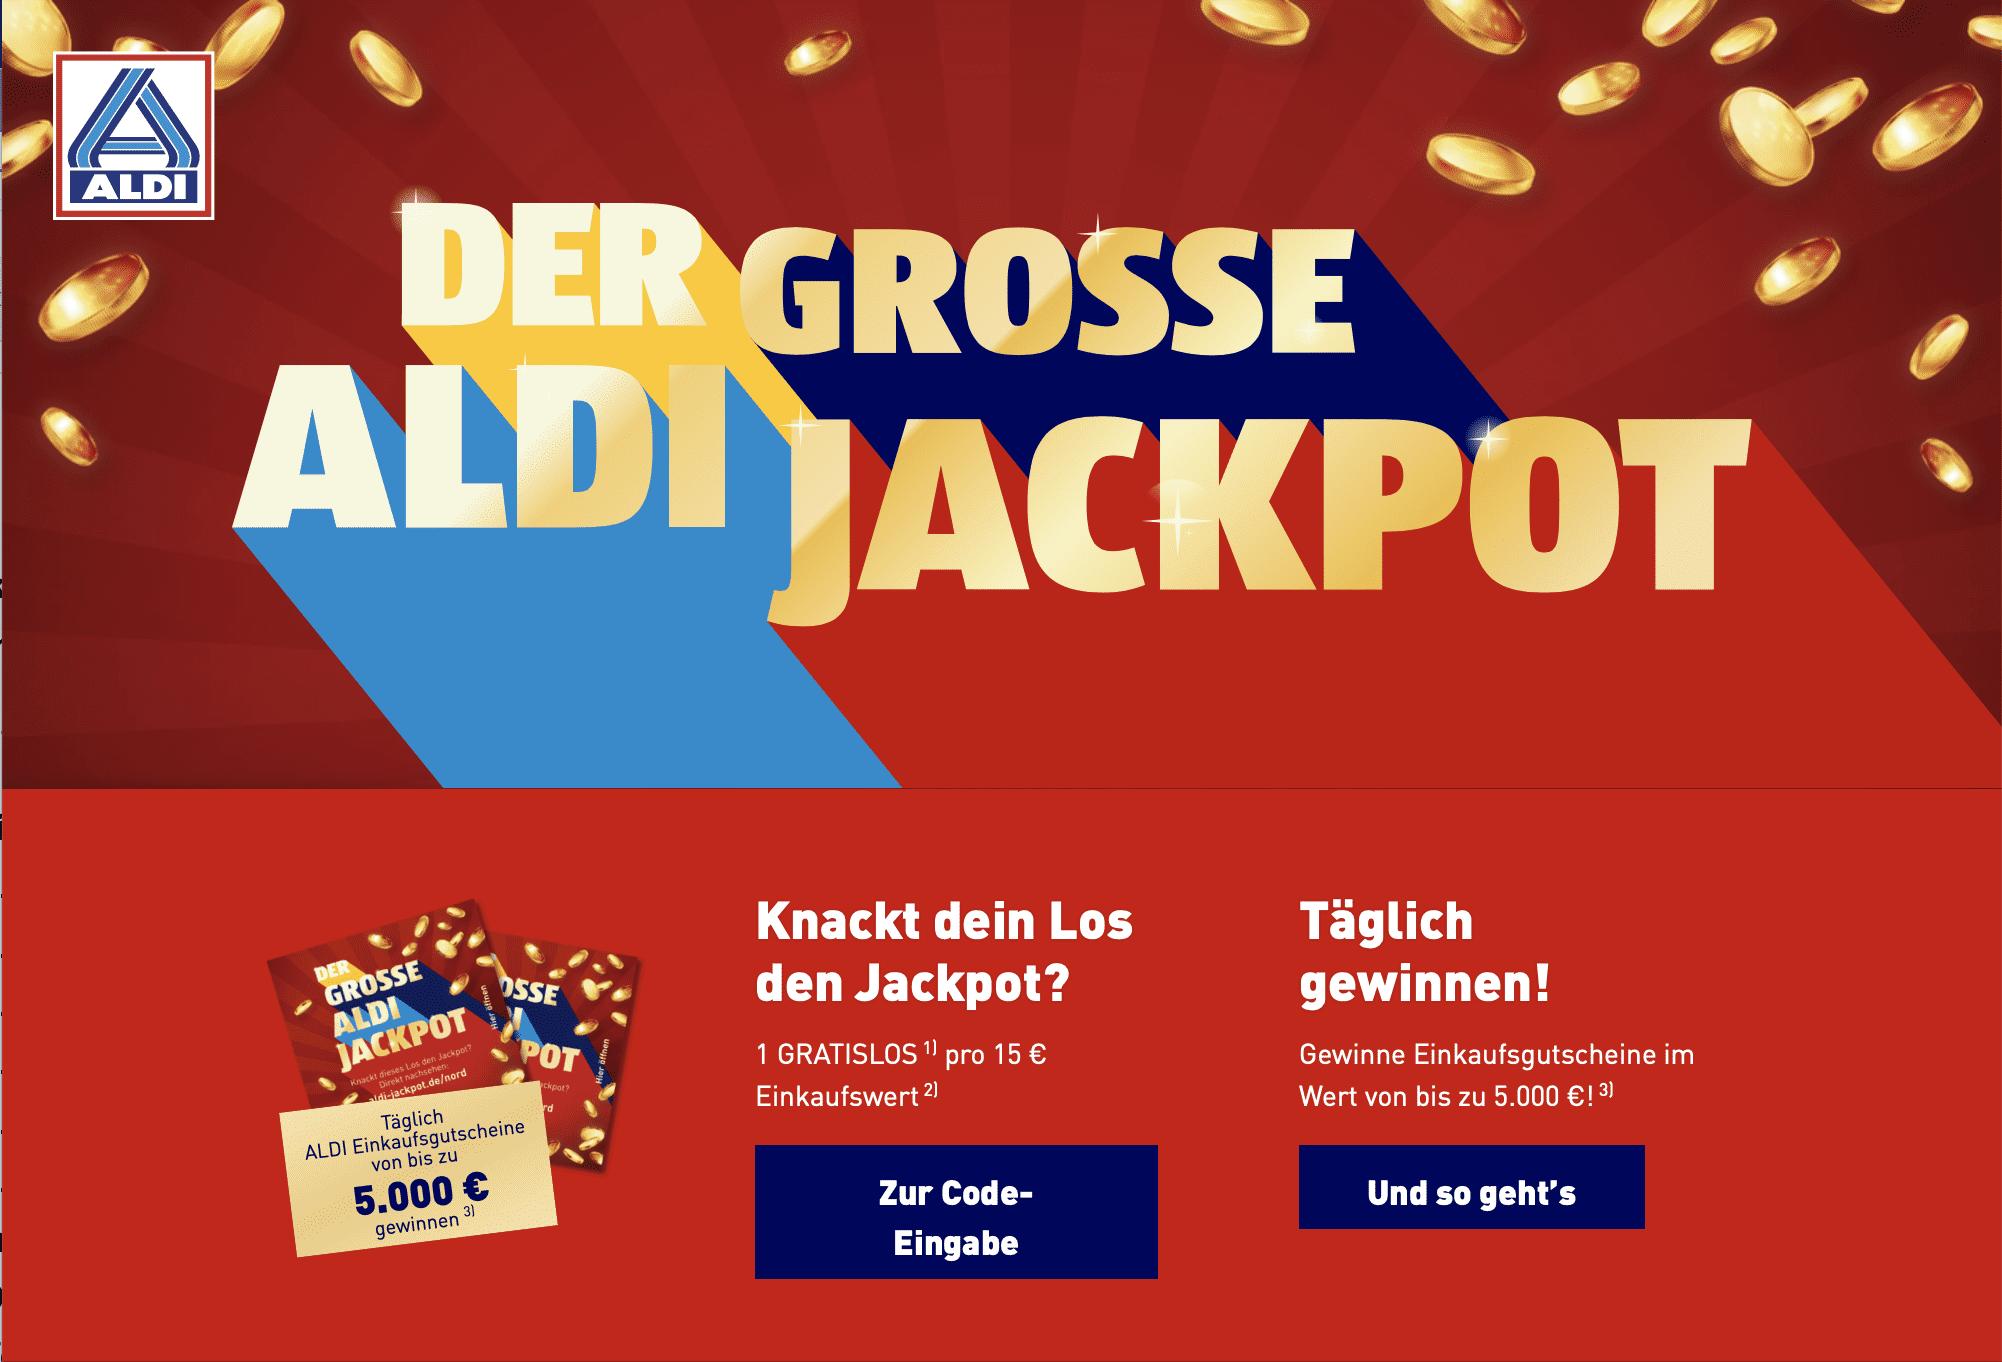 Gewinnspiel-Cases Lebensmittelhandel Aldi Jackpot